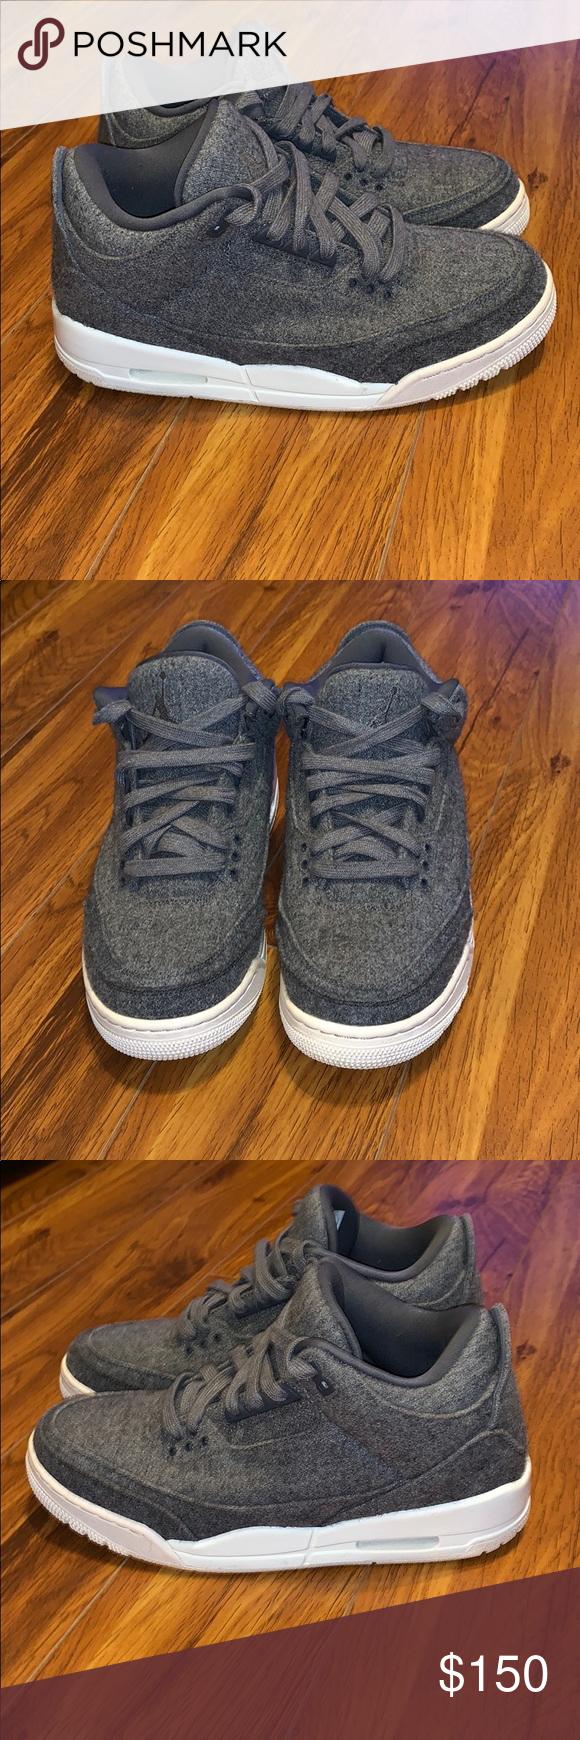 san francisco 3f7a8 11d3e Men s Jordan III 3 Wool Gray Sz 8.5 These Jordan shoes are in good used  condition. They are 100% Authentic. Jordan Shoes Athletic Shoes